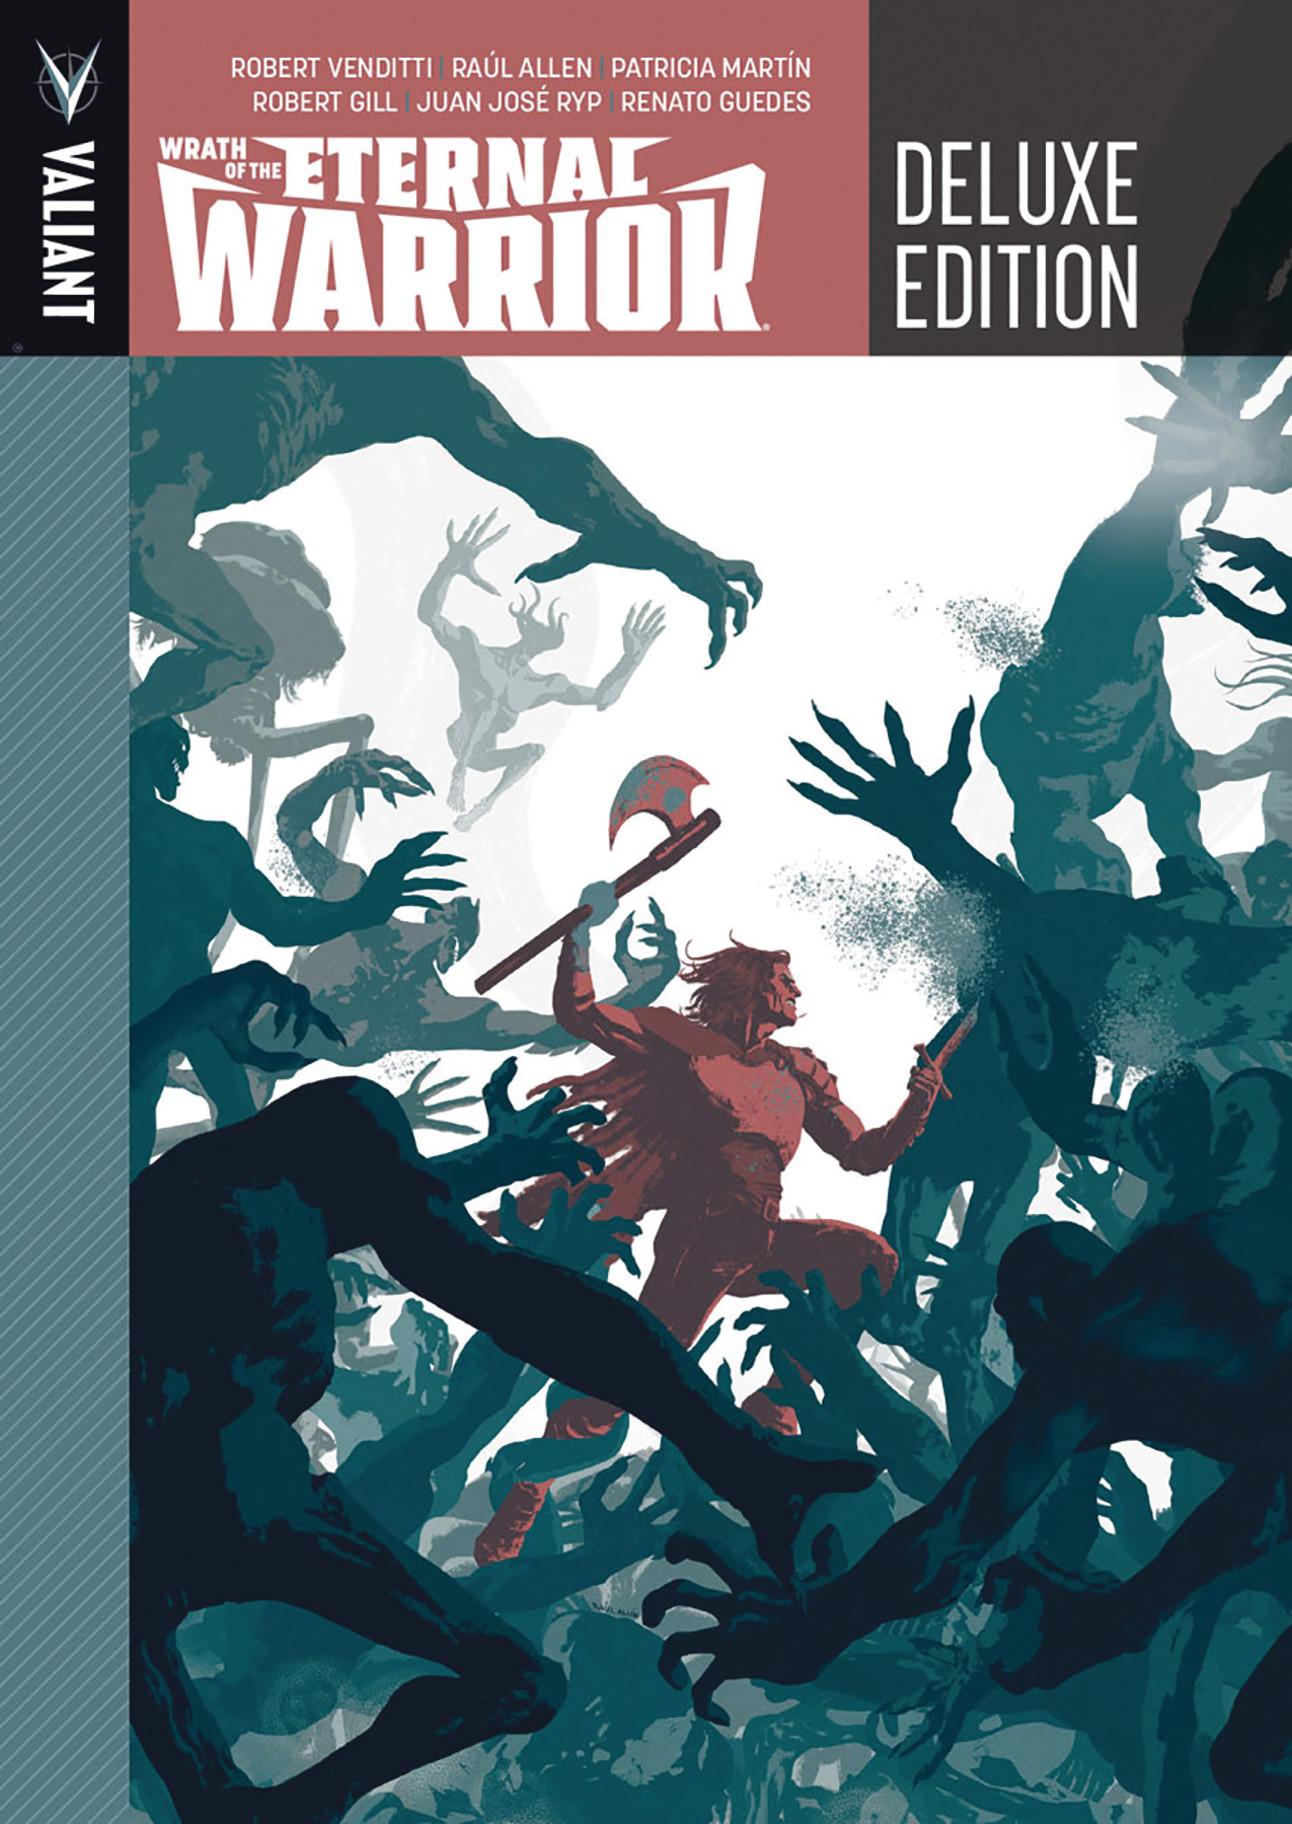 valiant_wrath_of_the_eternal_warrior.jpg